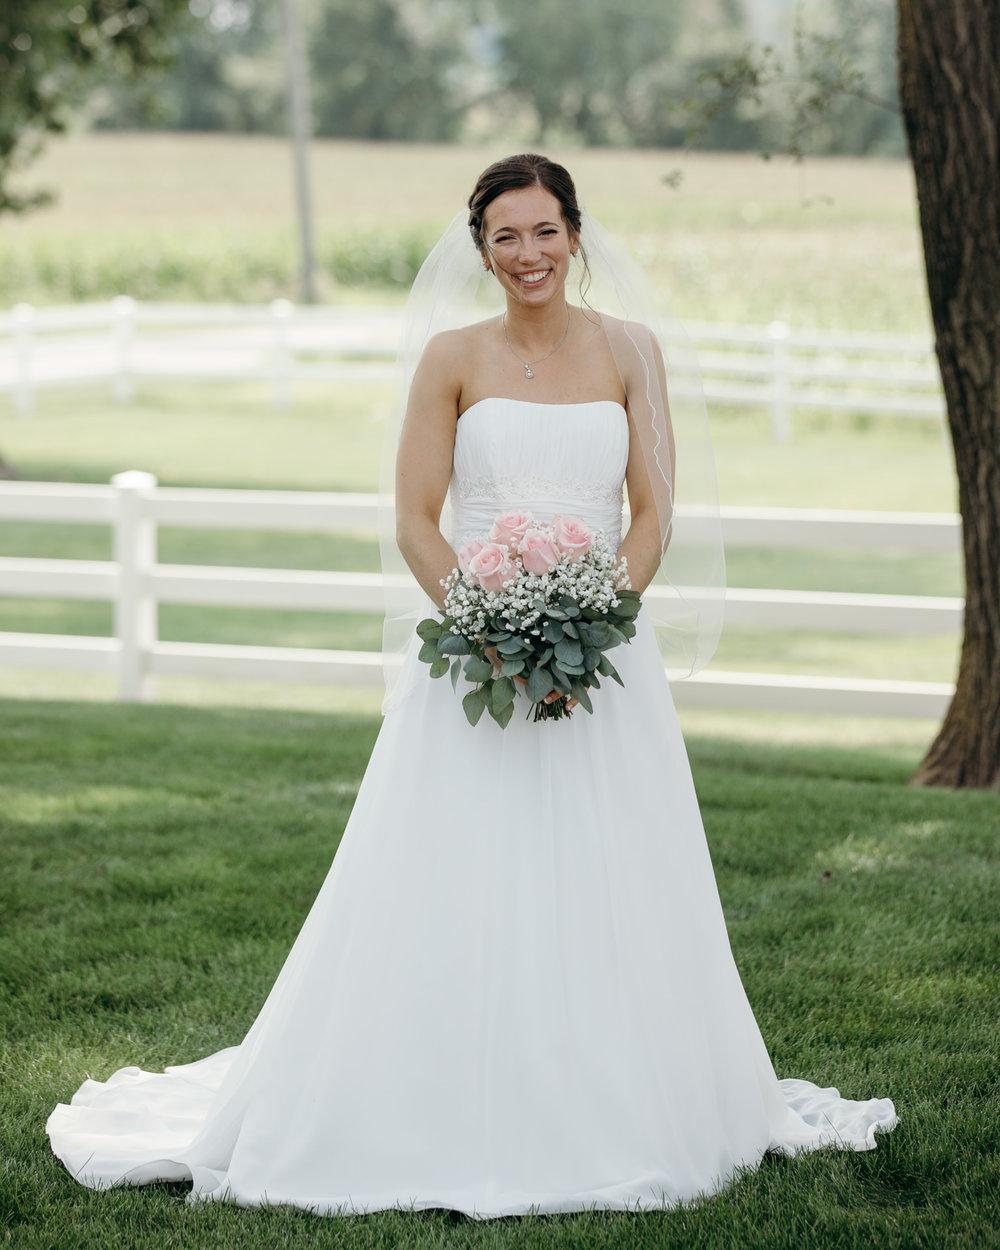 Grant Beachy weddings goshen elkhart bridal photography south bend chicago documentary -025.jpg